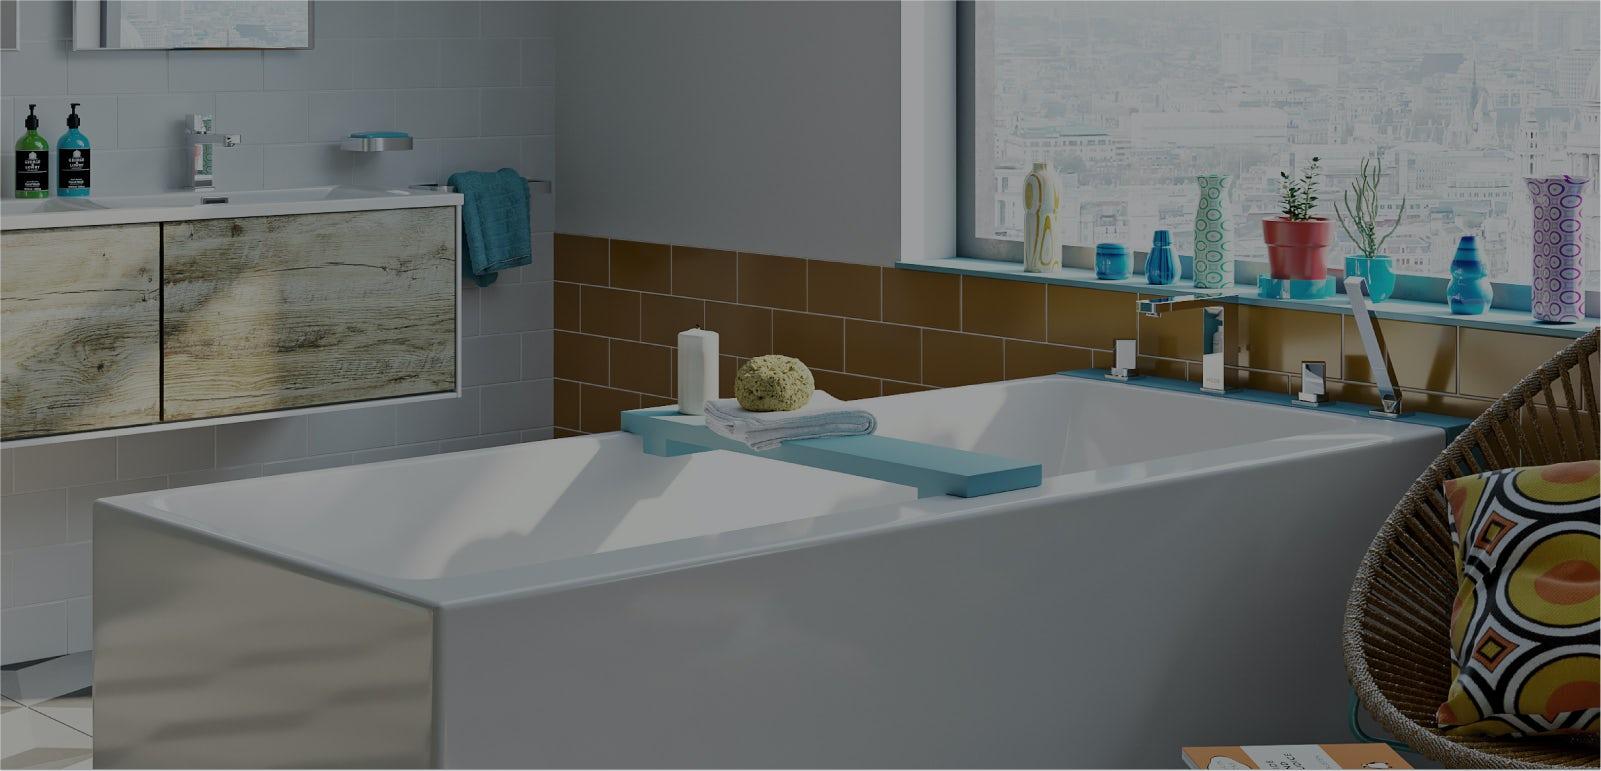 Bathroom ideas: New Retro part 4